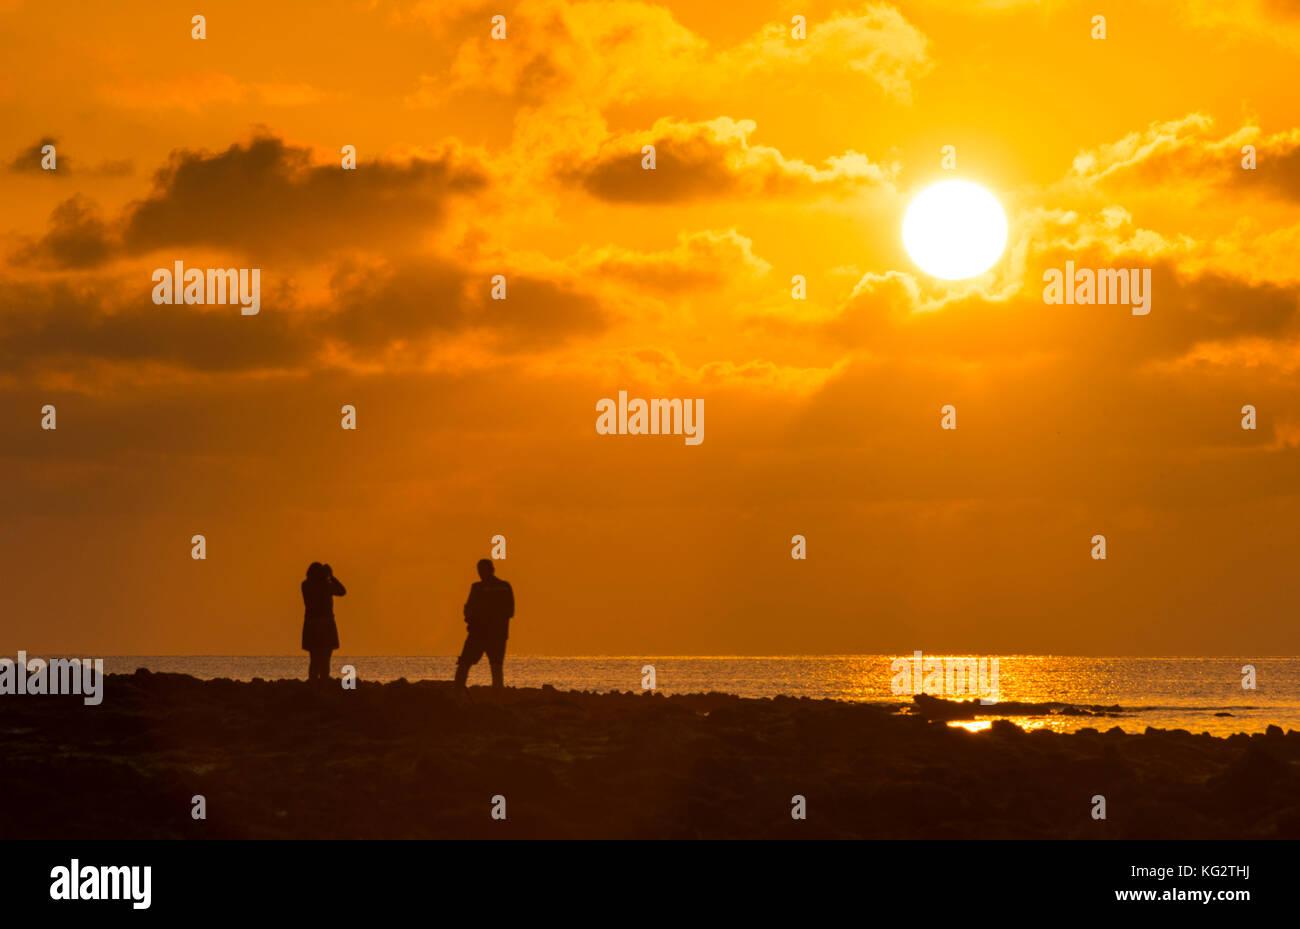 Silhouette figures admire sunrise at Arrecife, Lanzarote. - Stock Image